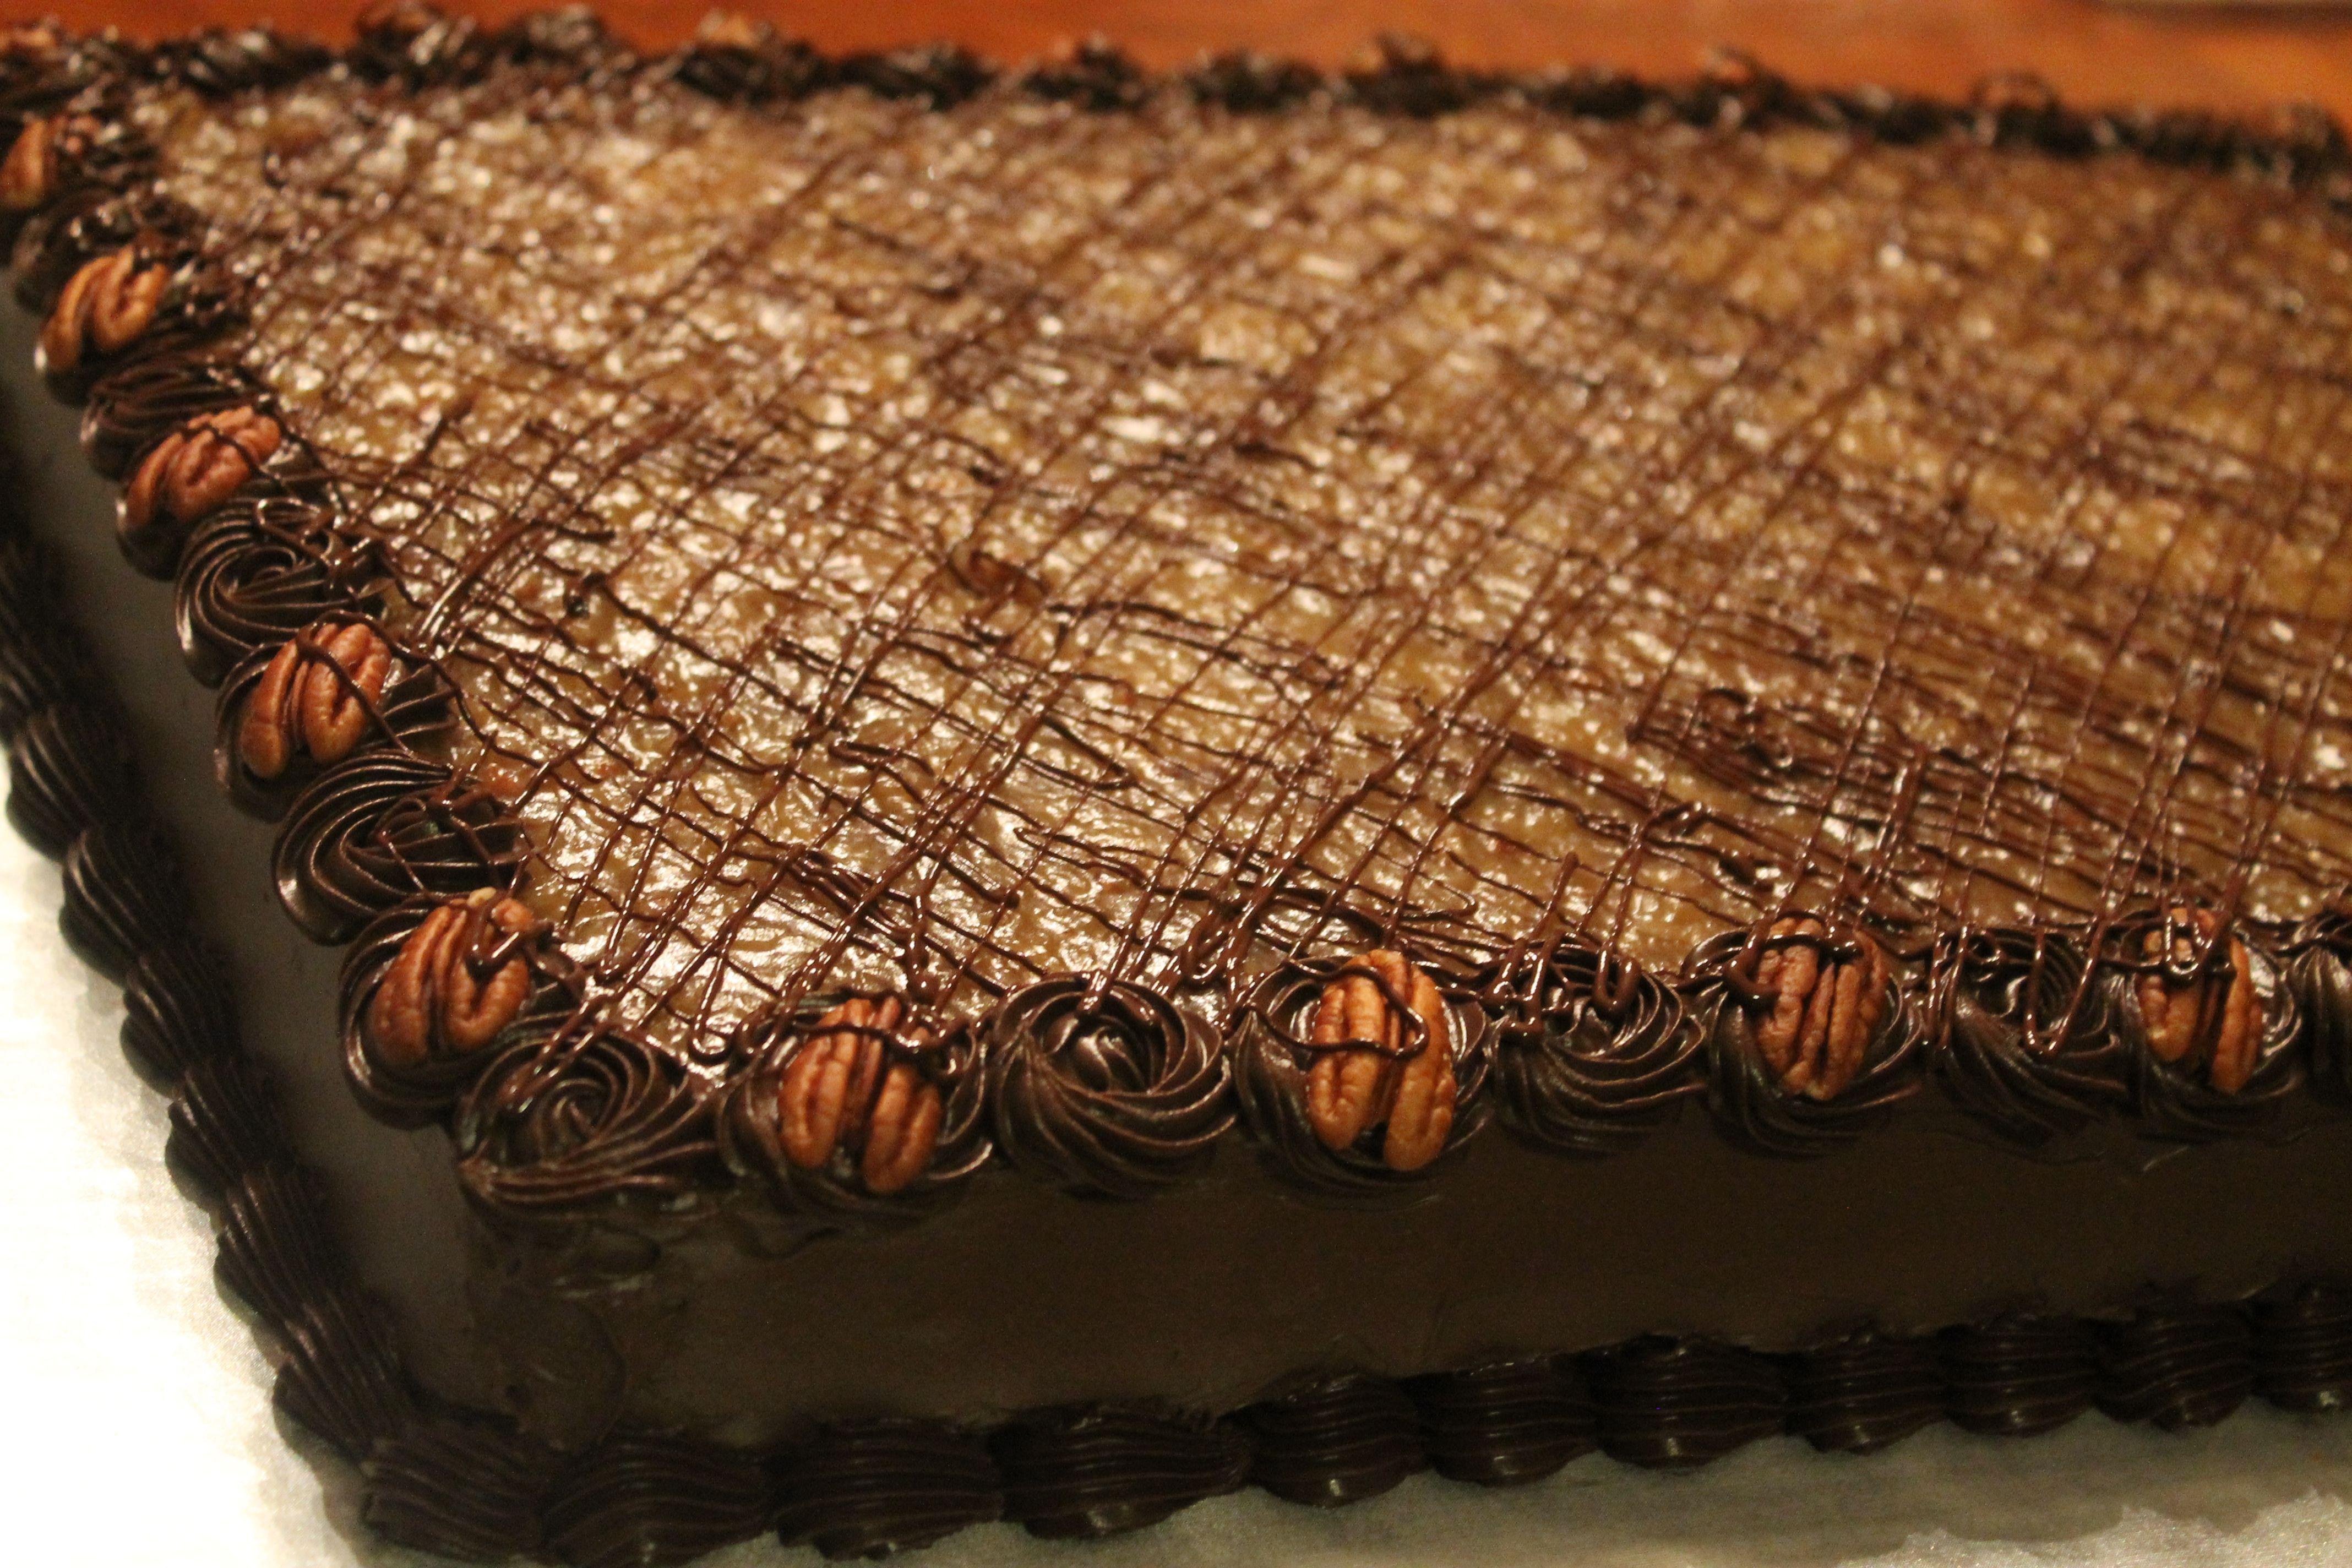 German Chocolate Sheet Cake Germanchocolate Sheetcake With